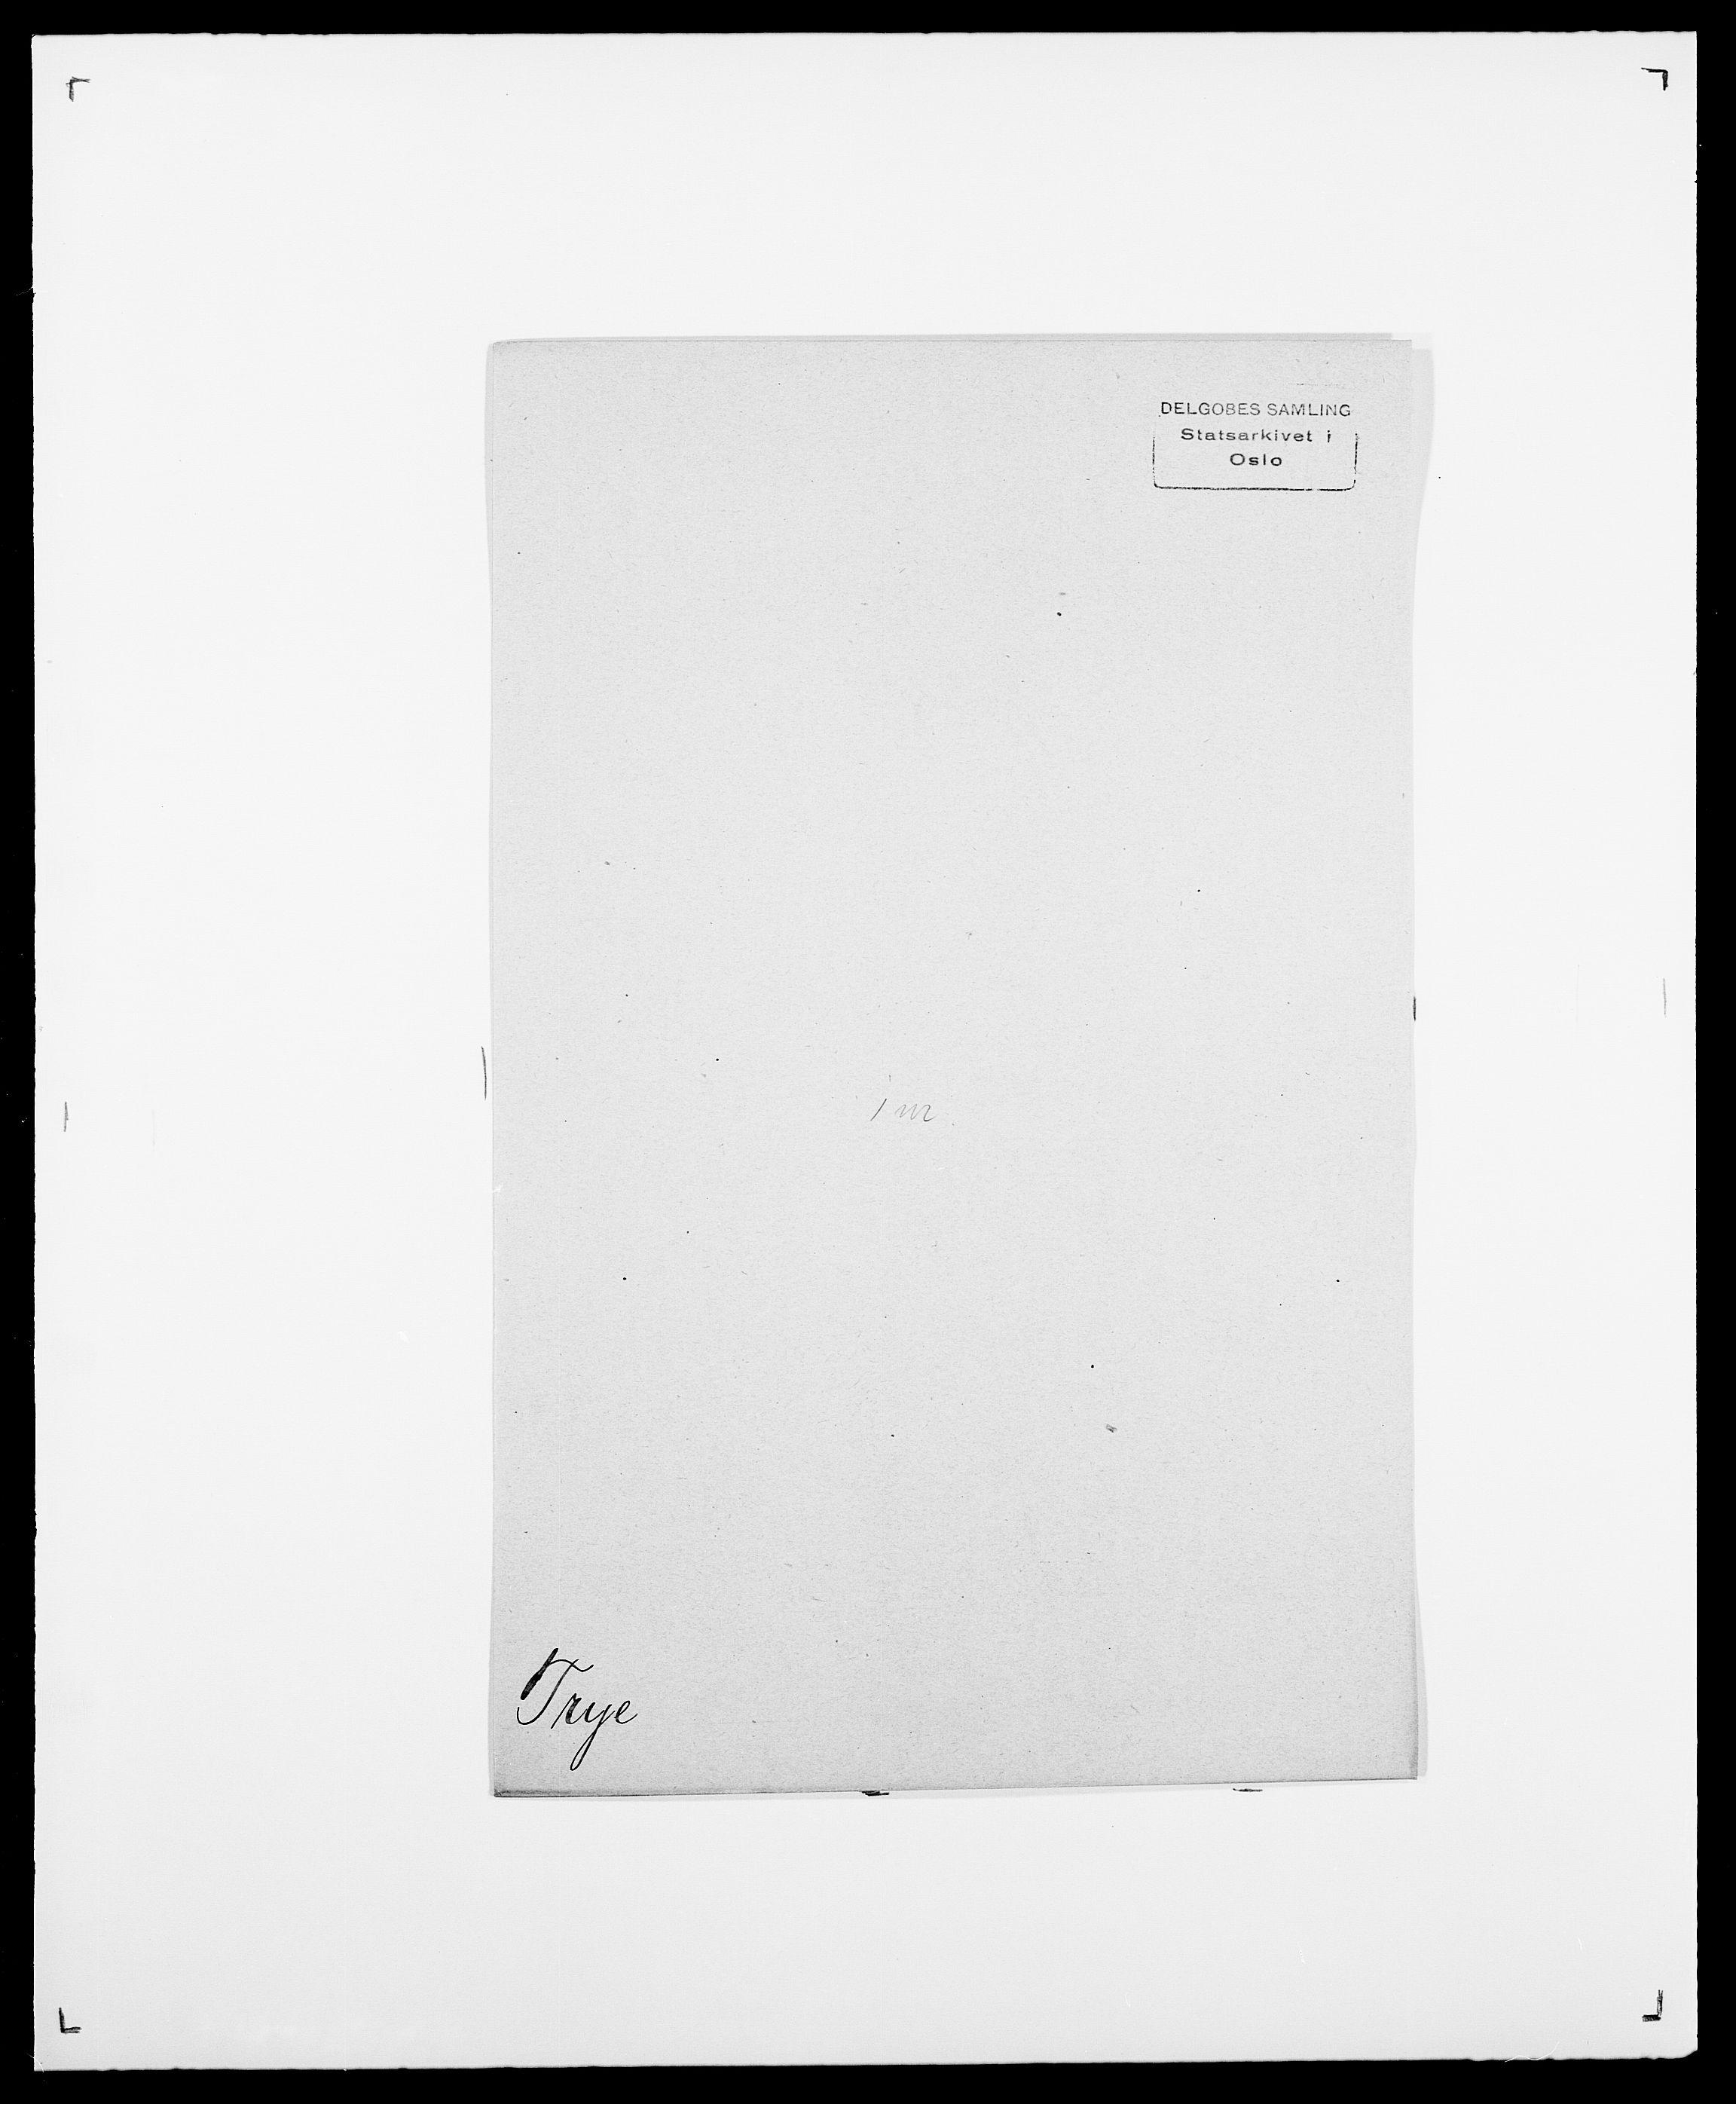 SAO, Delgobe, Charles Antoine - samling, D/Da/L0039: Thorsen - Urup, s. 422